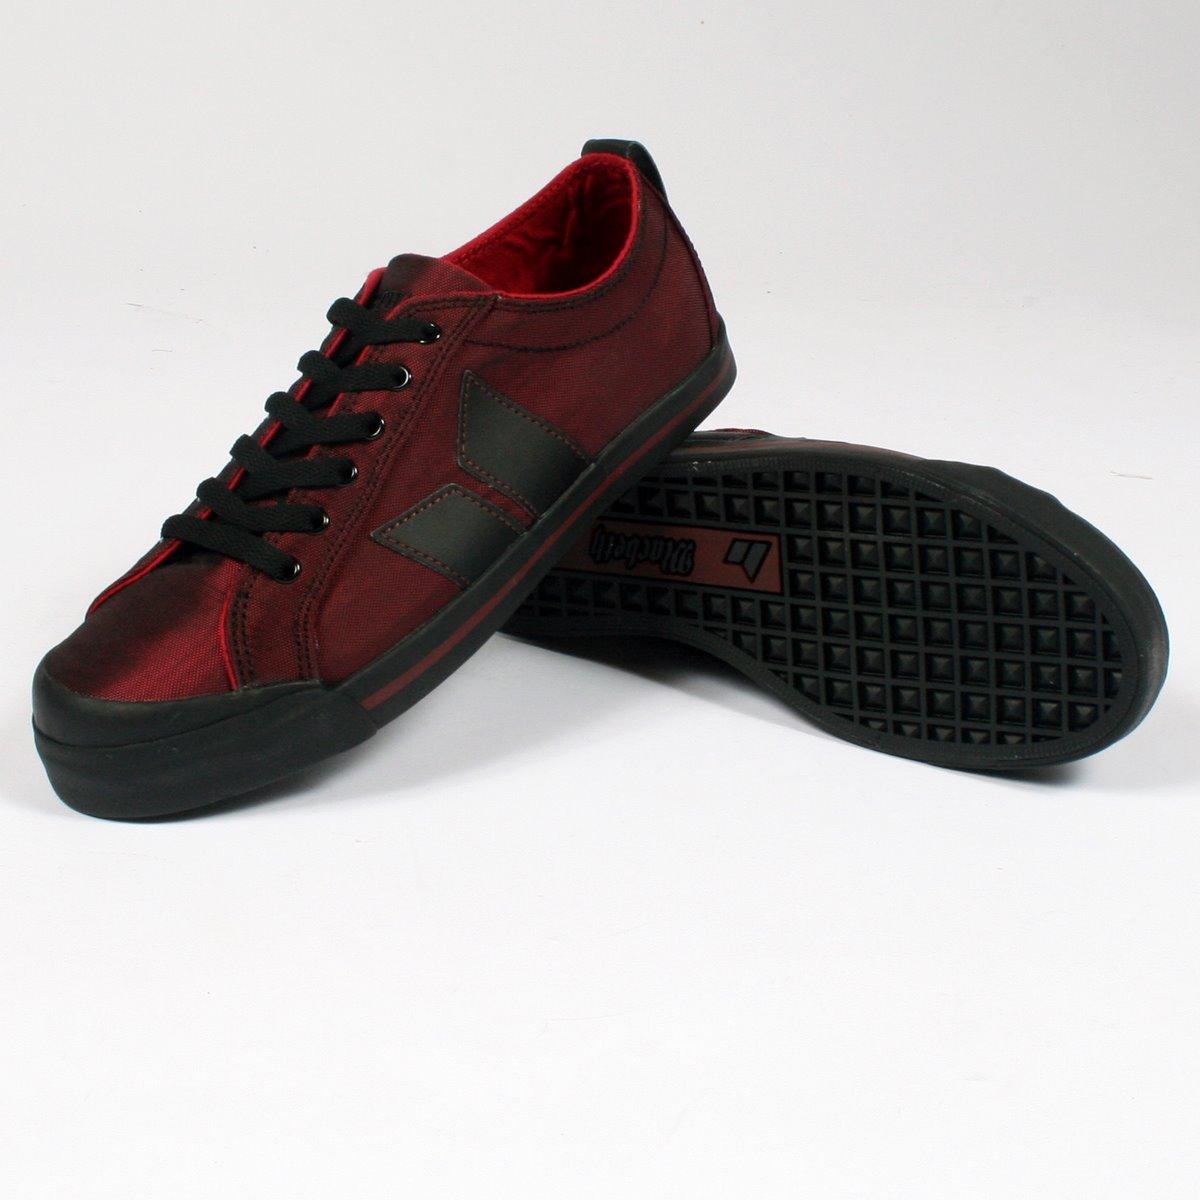 Macbeth Eliot Vegan Shoes Eliot Mens Vegan Shoes in